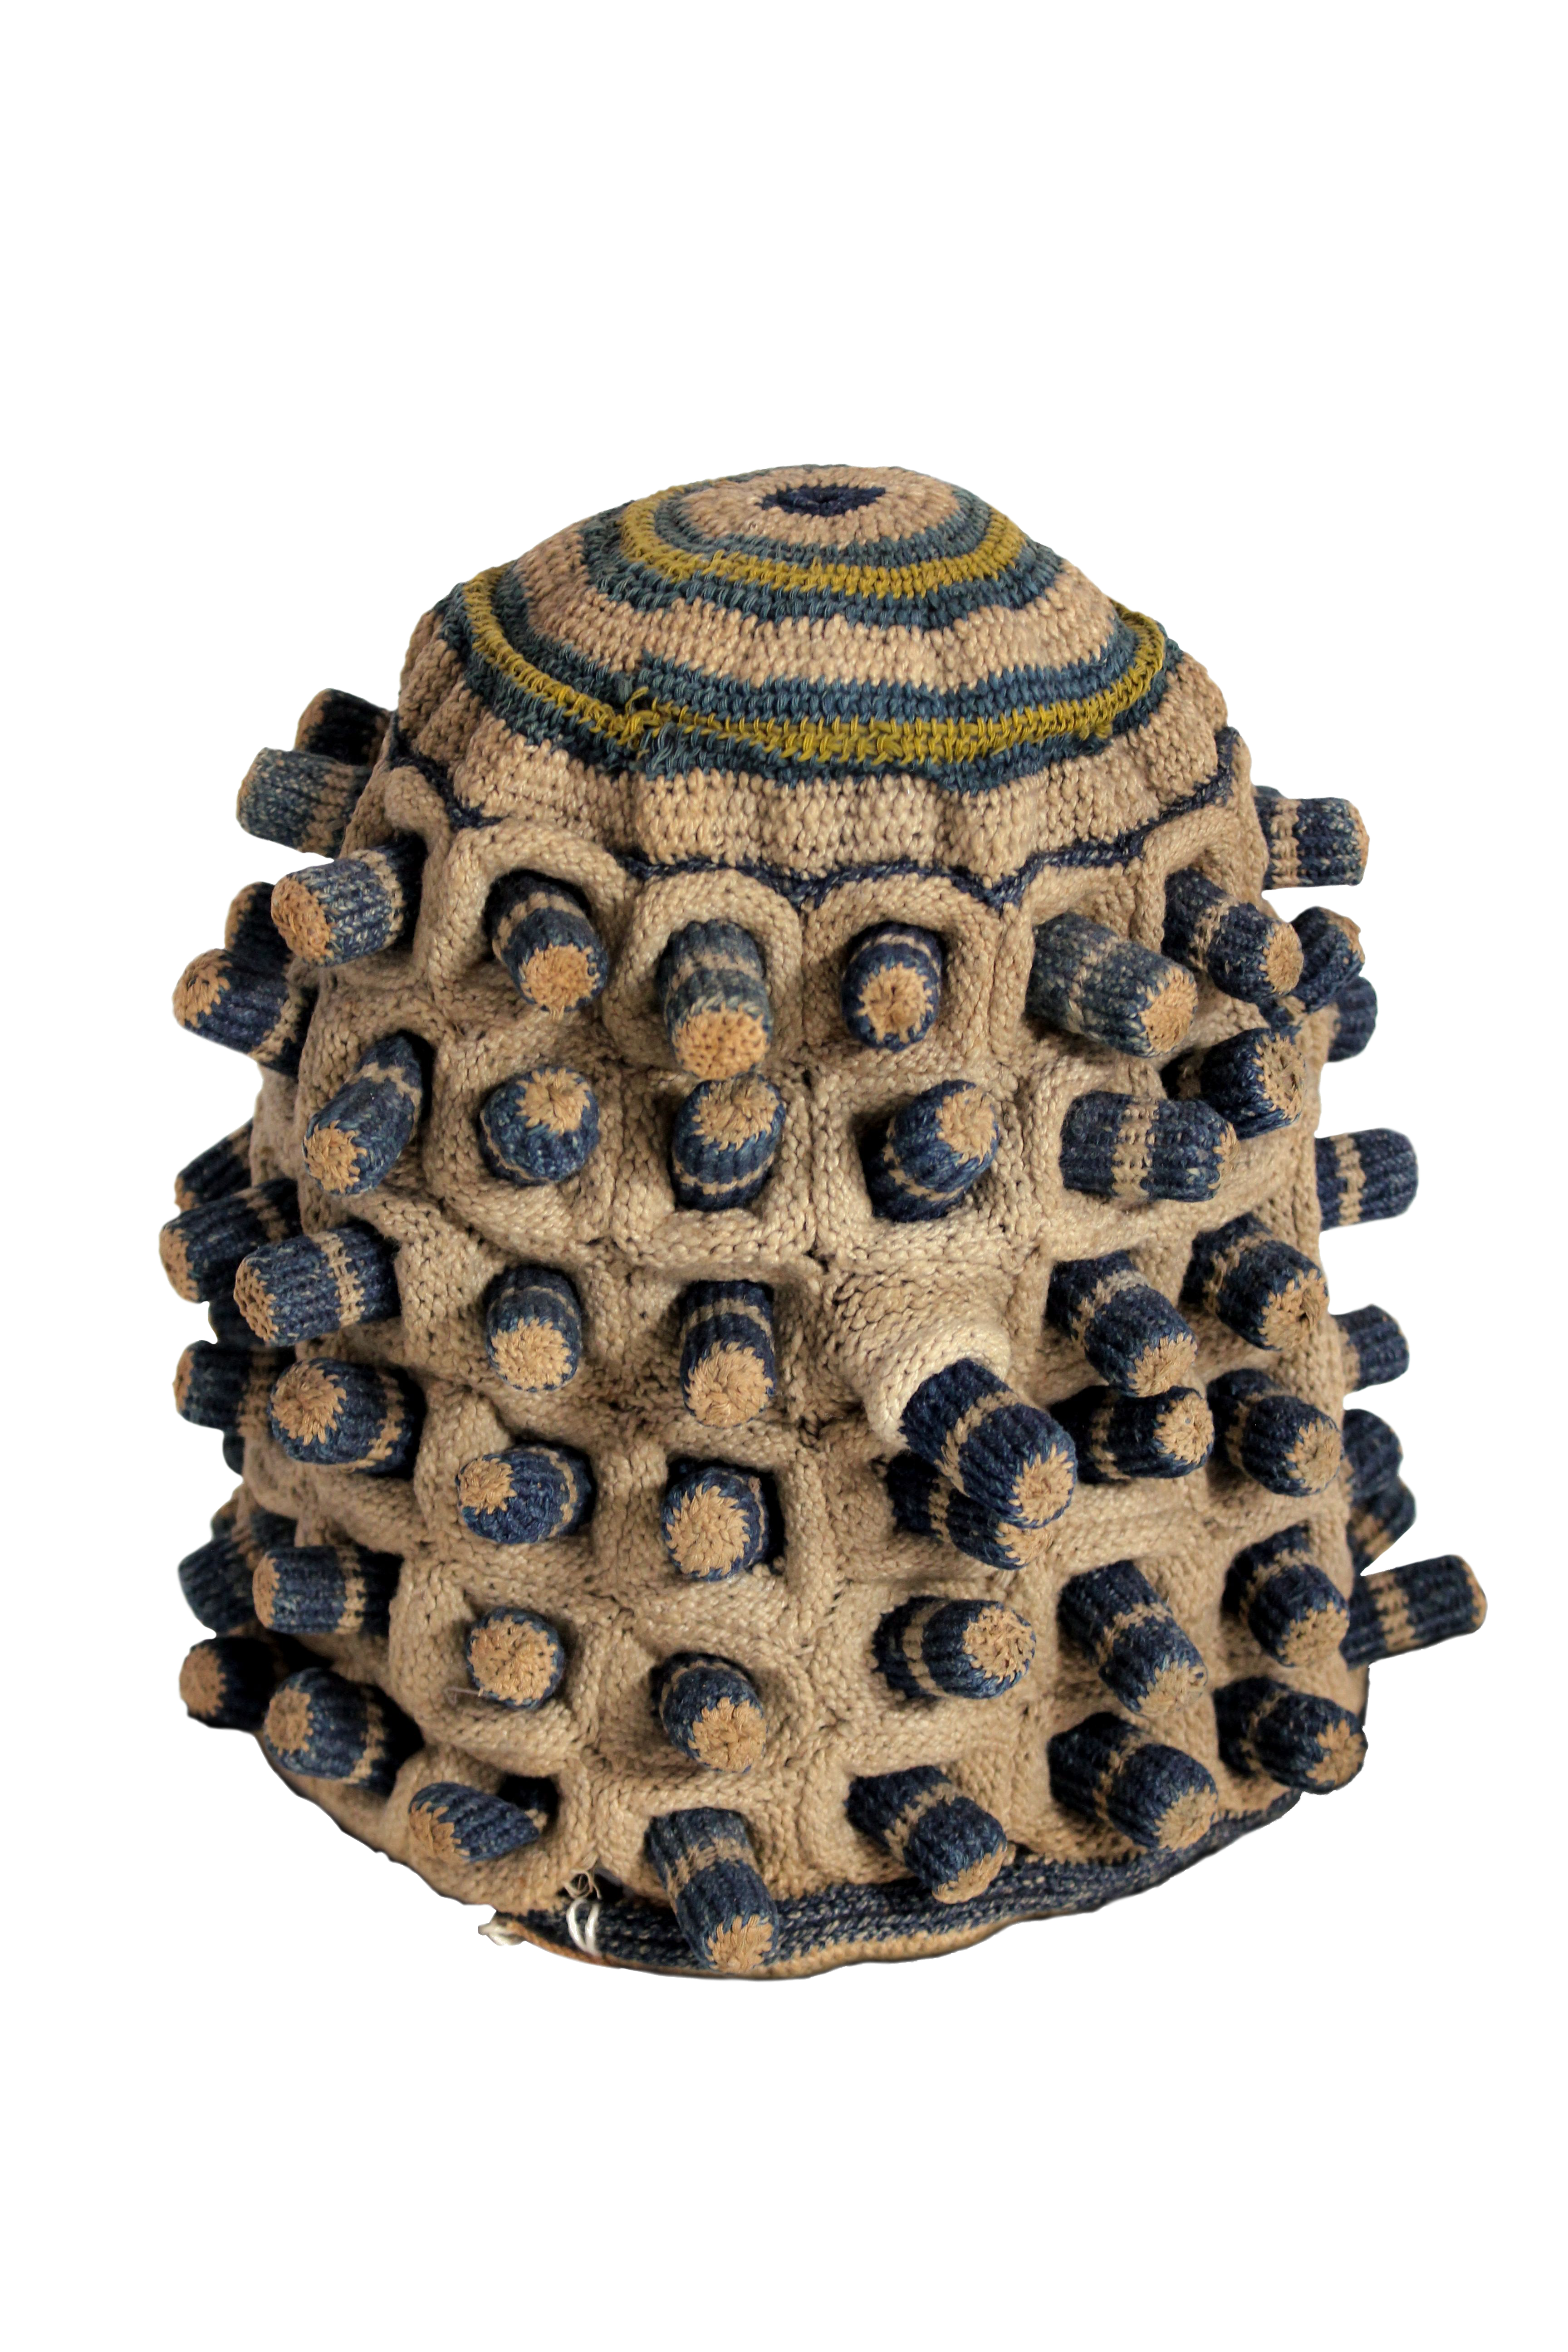 3D-Darstellung der Mütze aus Kamerun